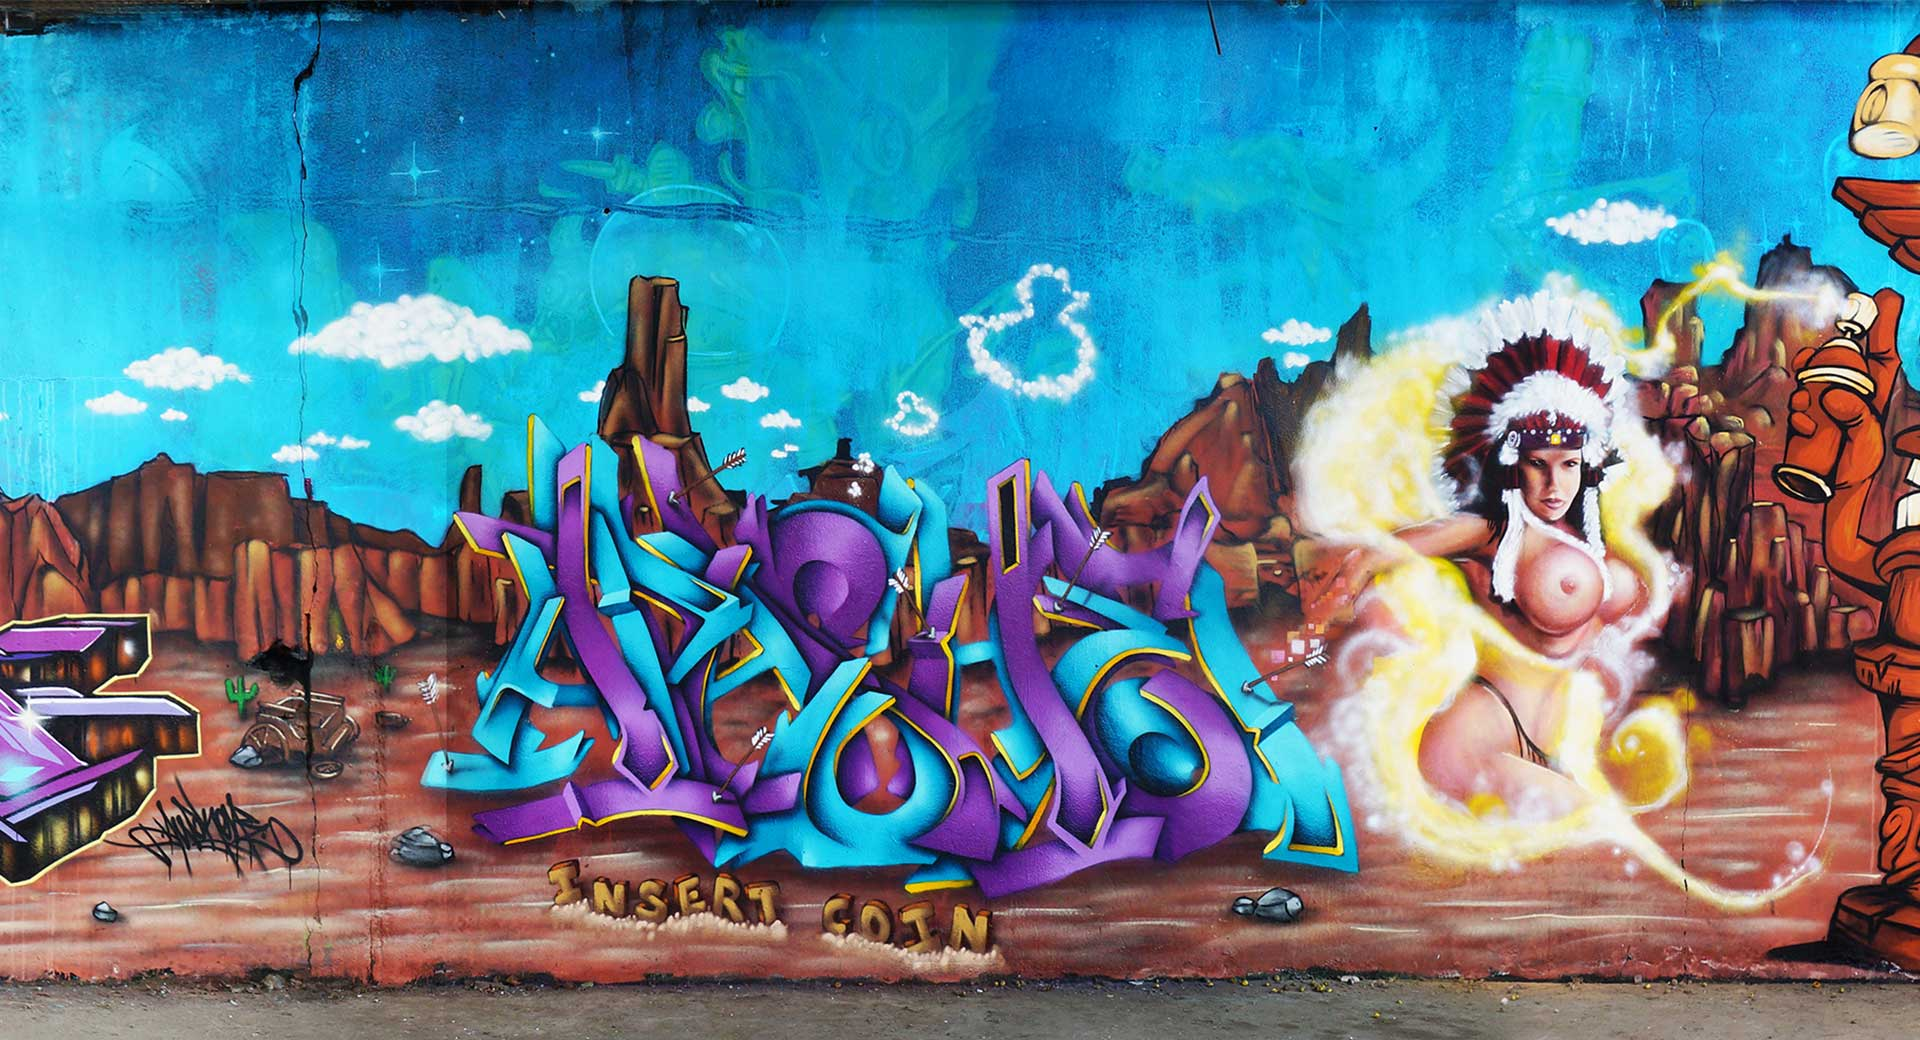 Insert Coin - Graffiti